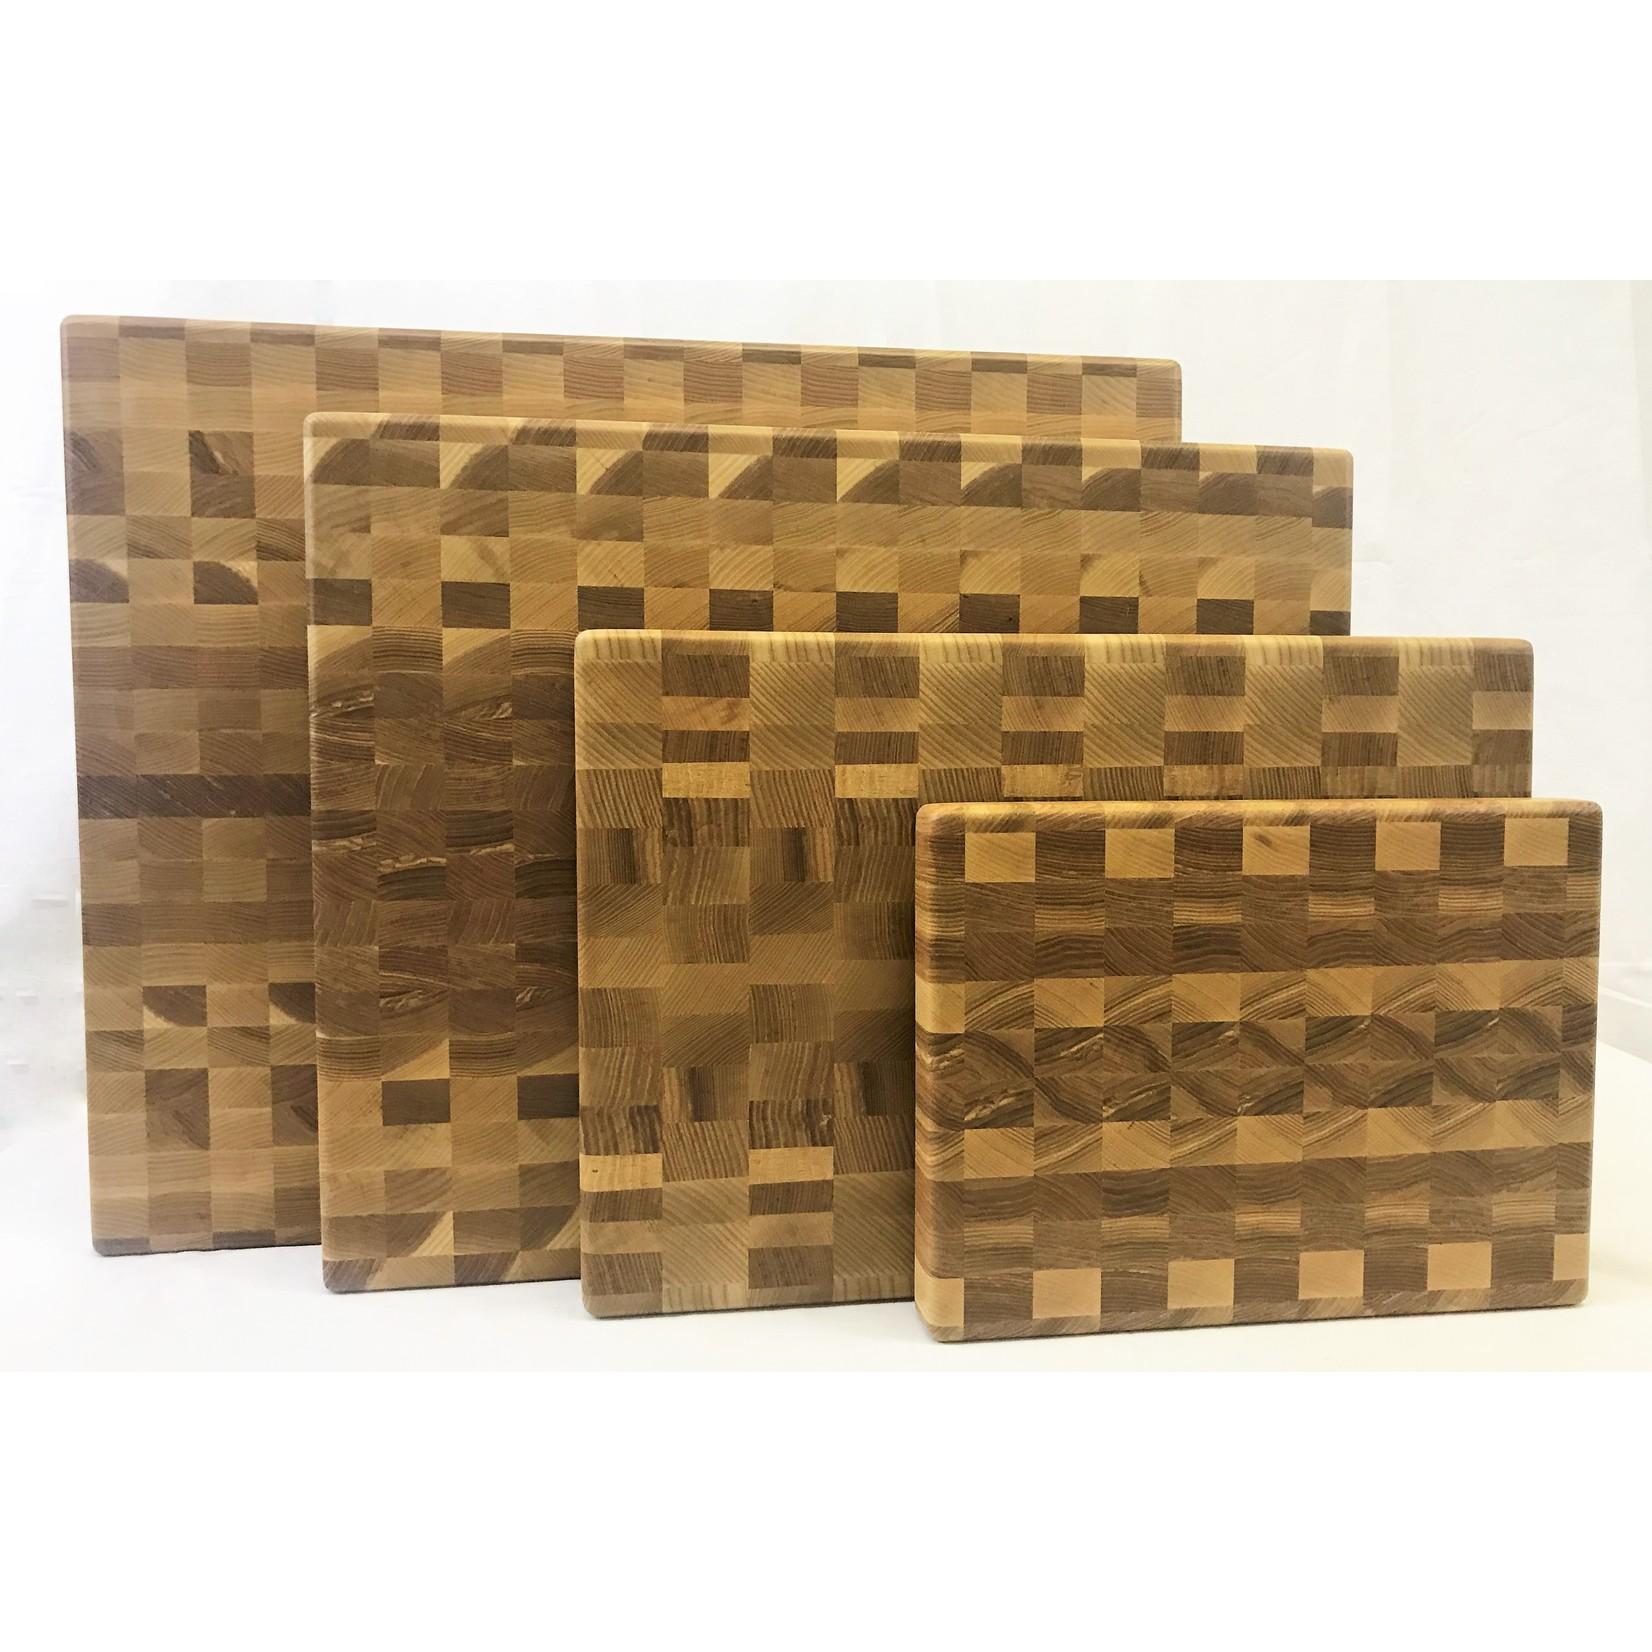 Richard Rose Culinary End Grain Cutting Board Ash Walnut 18 x 12 x 1 3/8